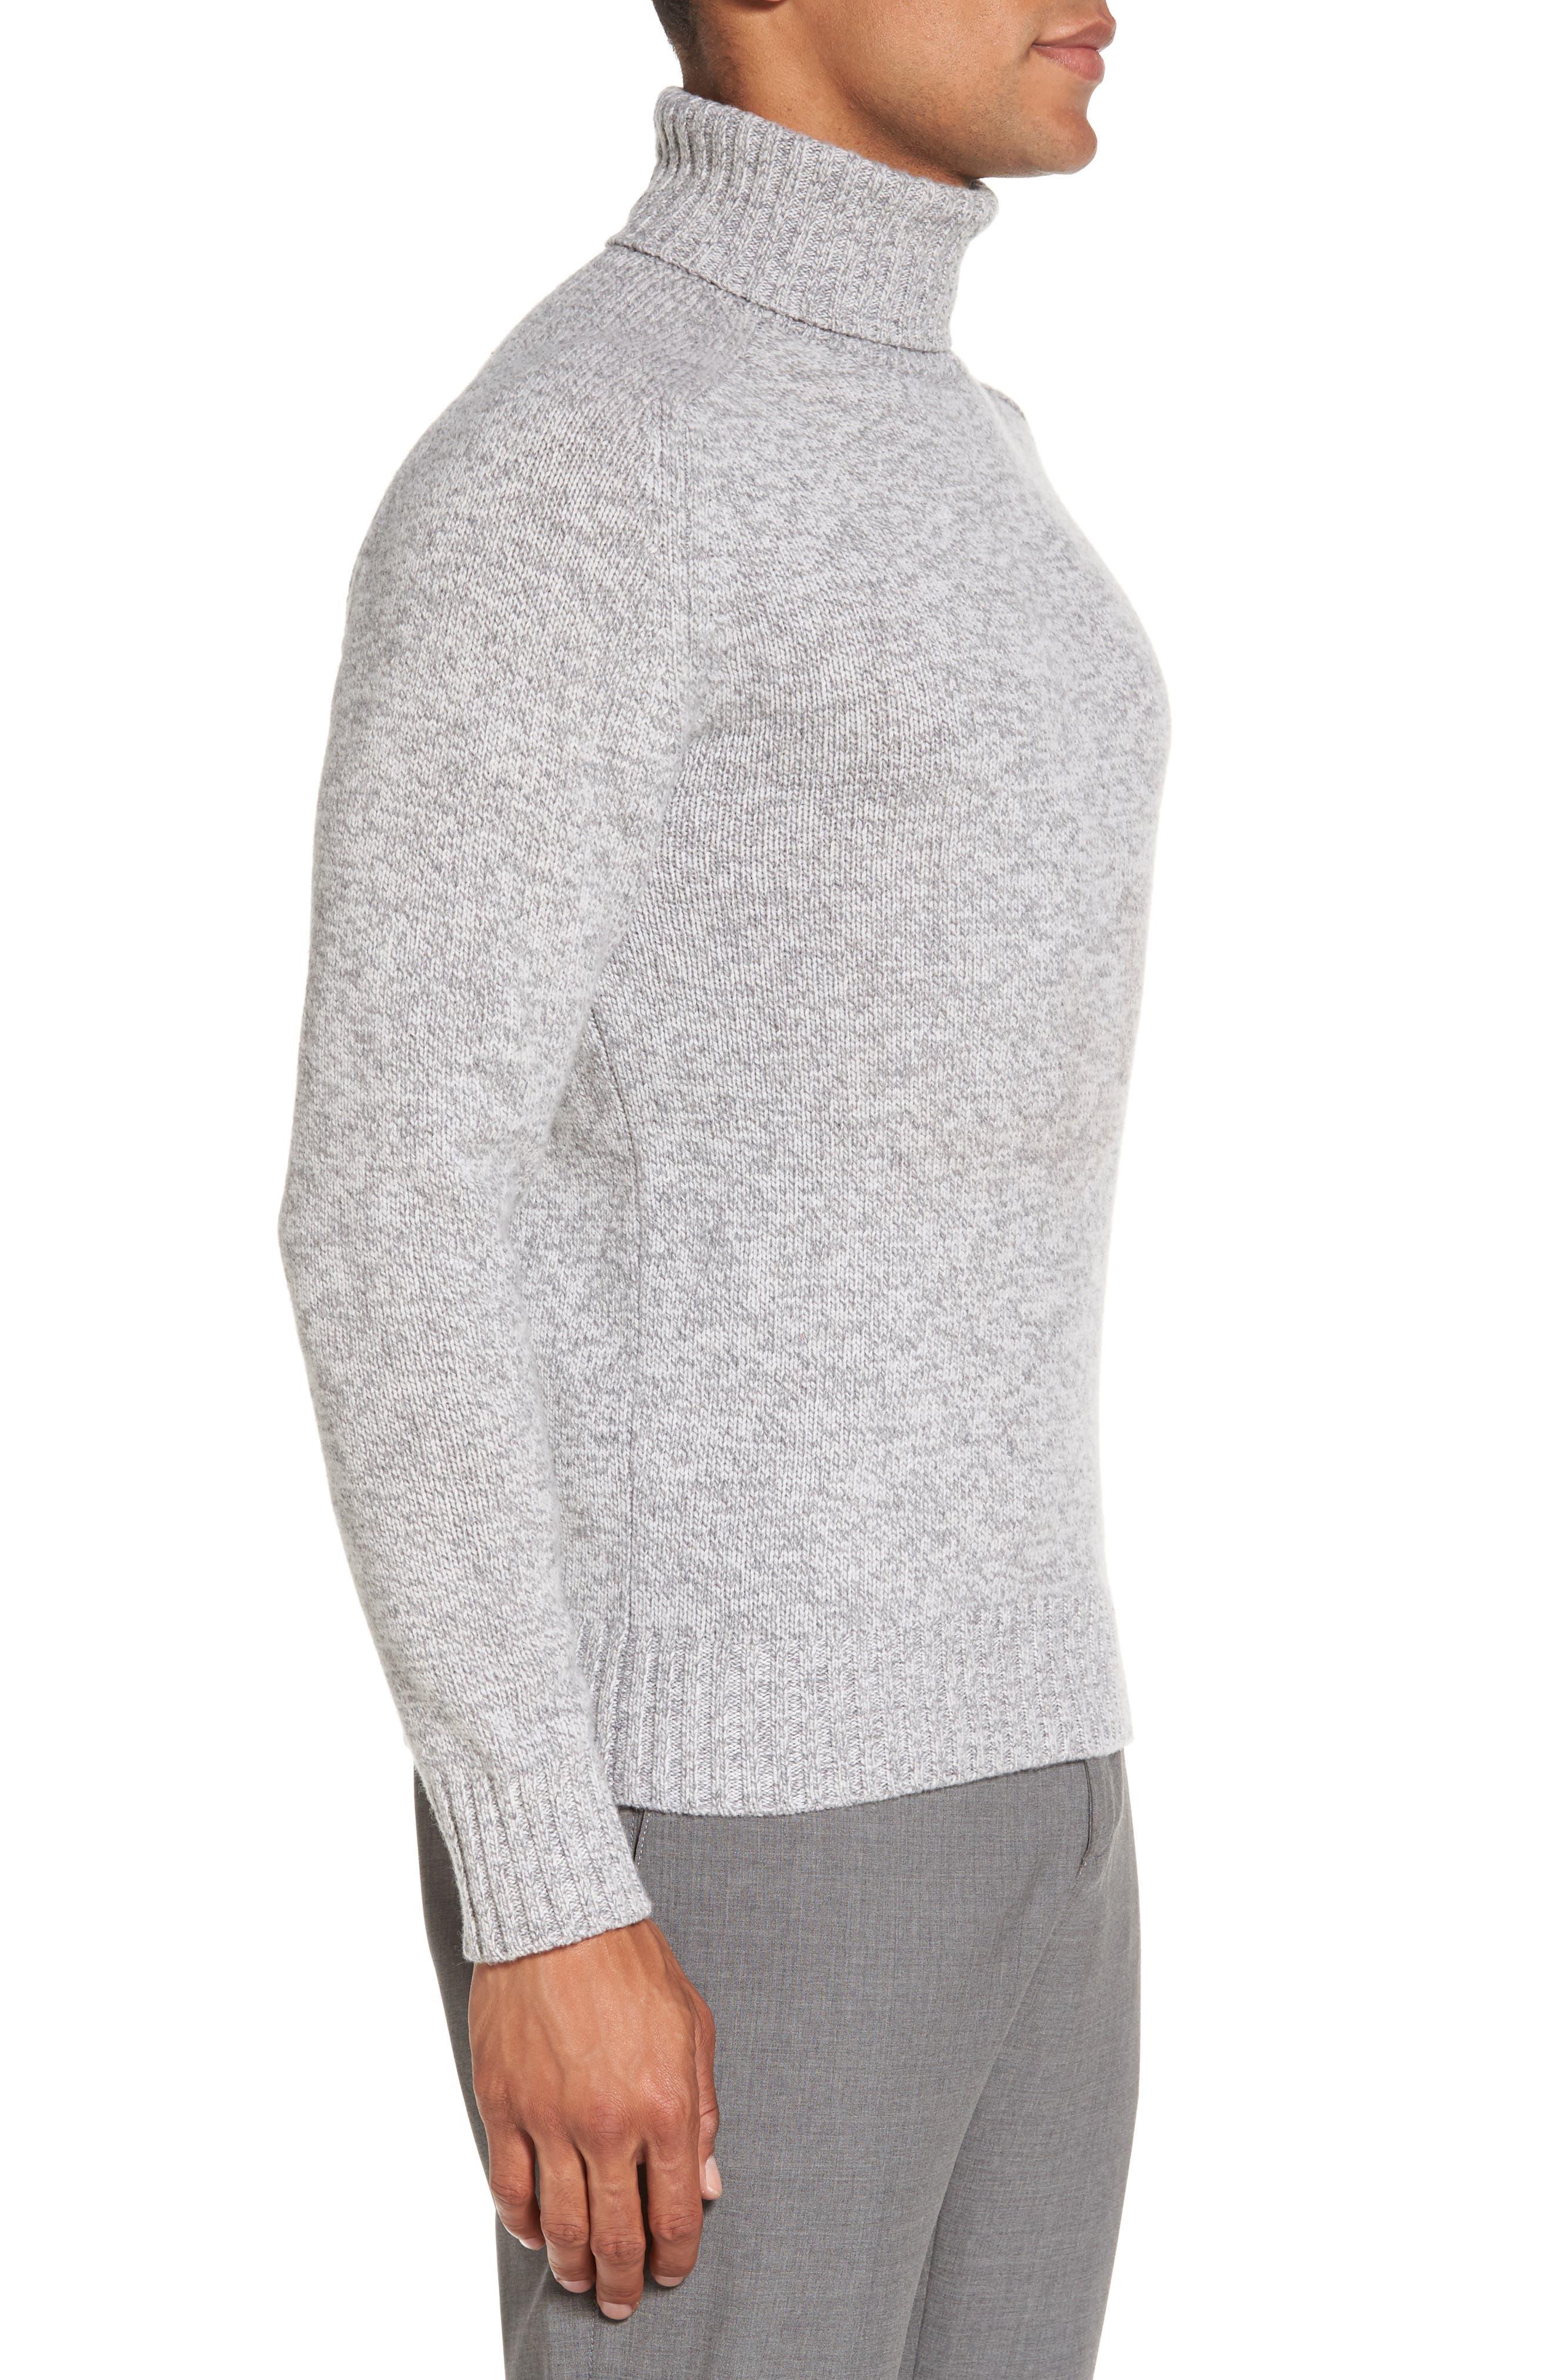 Marled Turtleneck Sweater,                             Alternate thumbnail 3, color,                             054